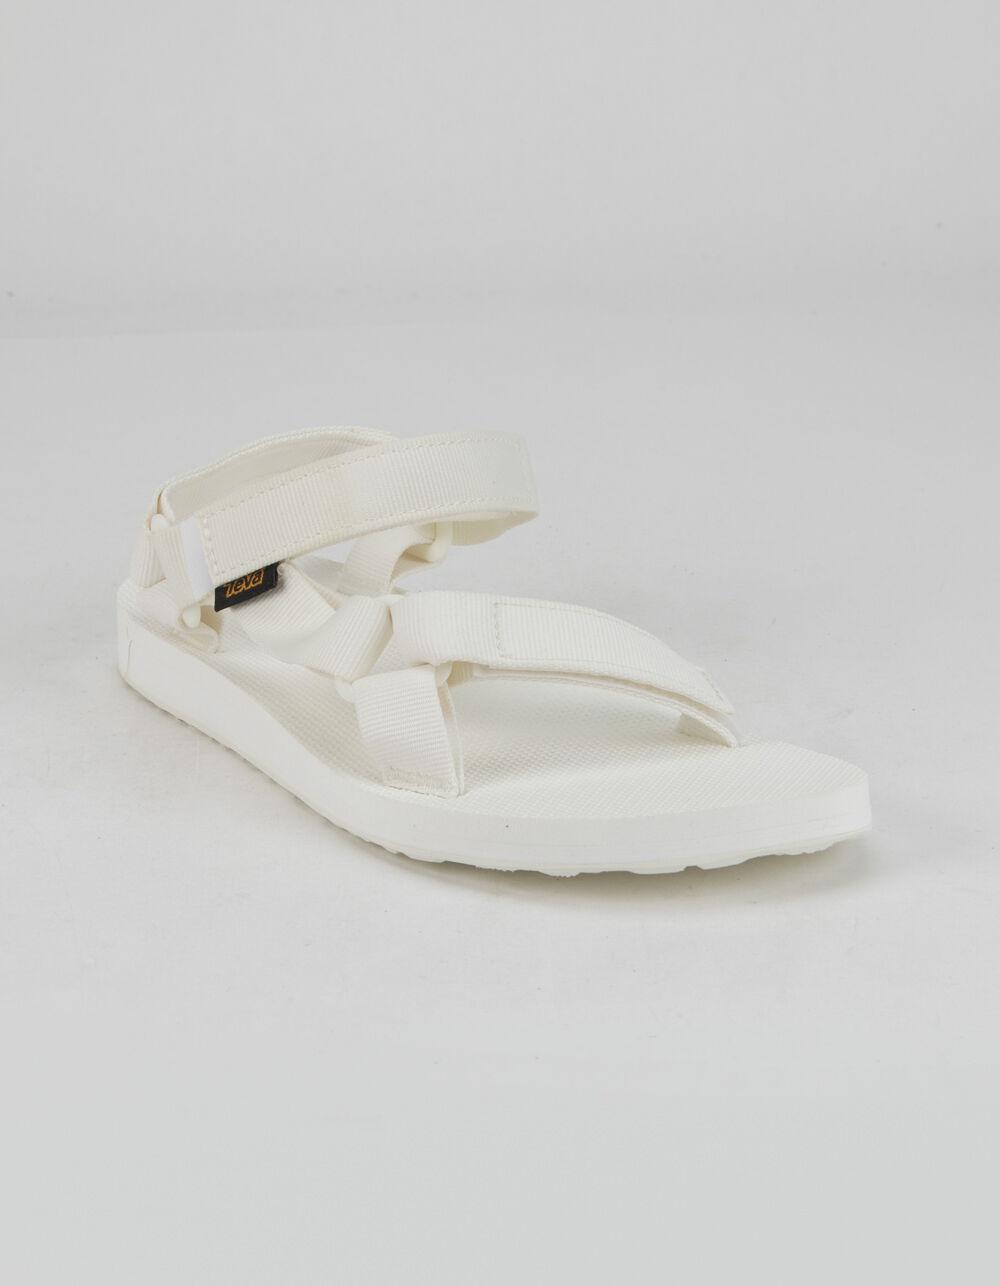 TEVA Original Universal White Sandals